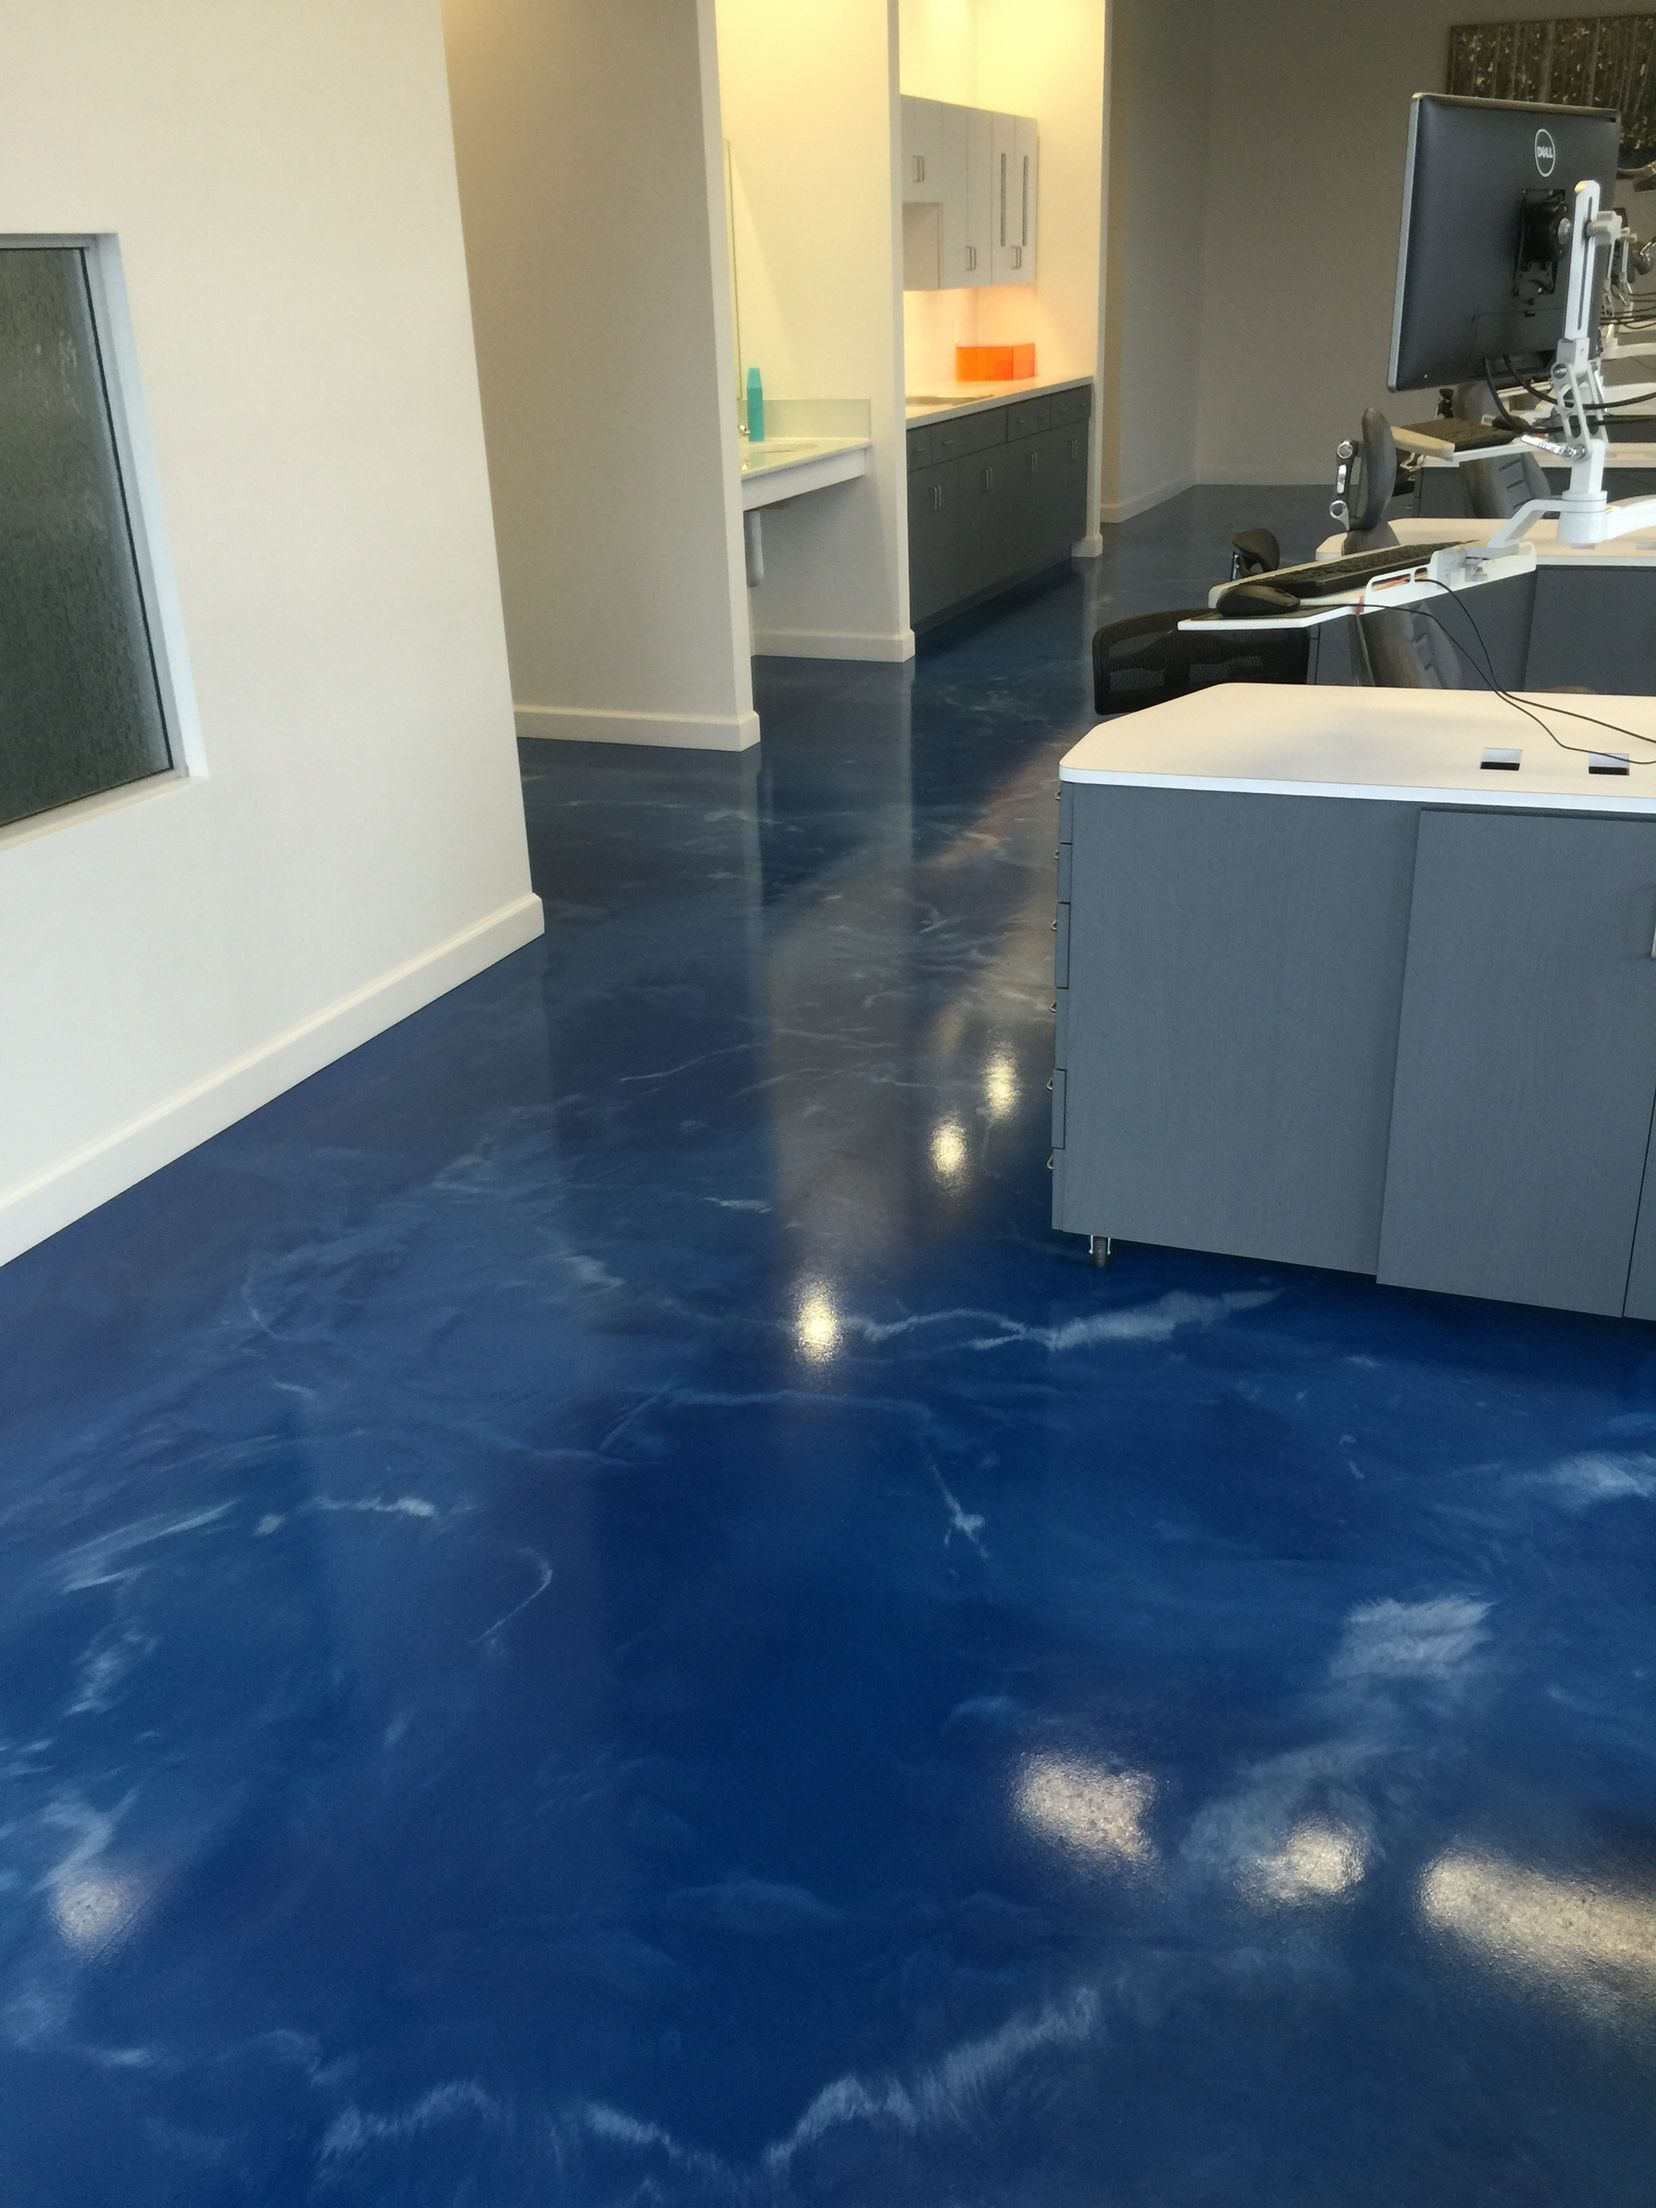 Metallic Epoxy Floor Installed For A Dental Office By Sierra Concrete Arts Metallic Epoxy Floor Epoxy Floor Floor Installation